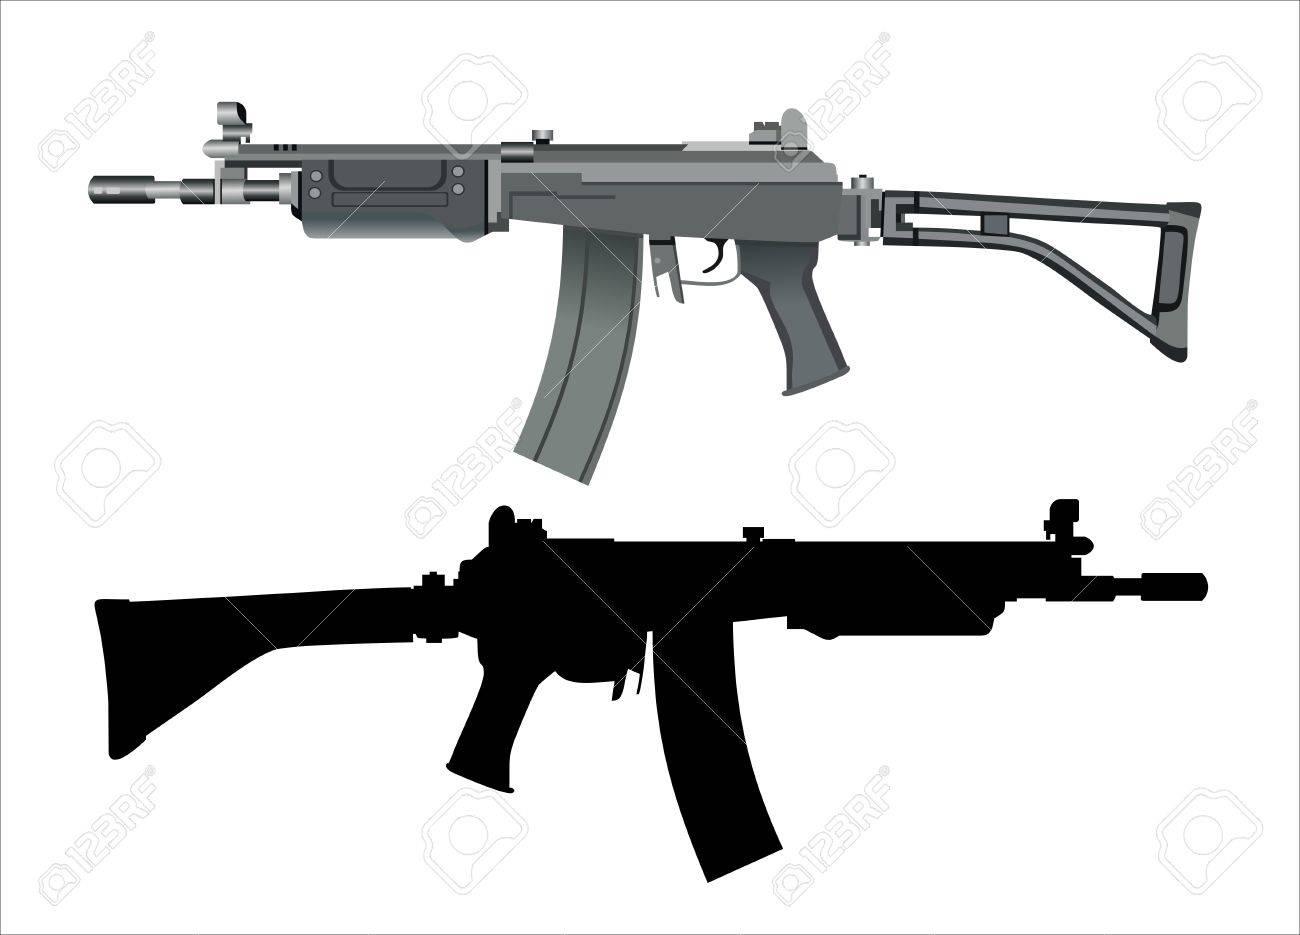 machine gun isolated on the white background - 16084694